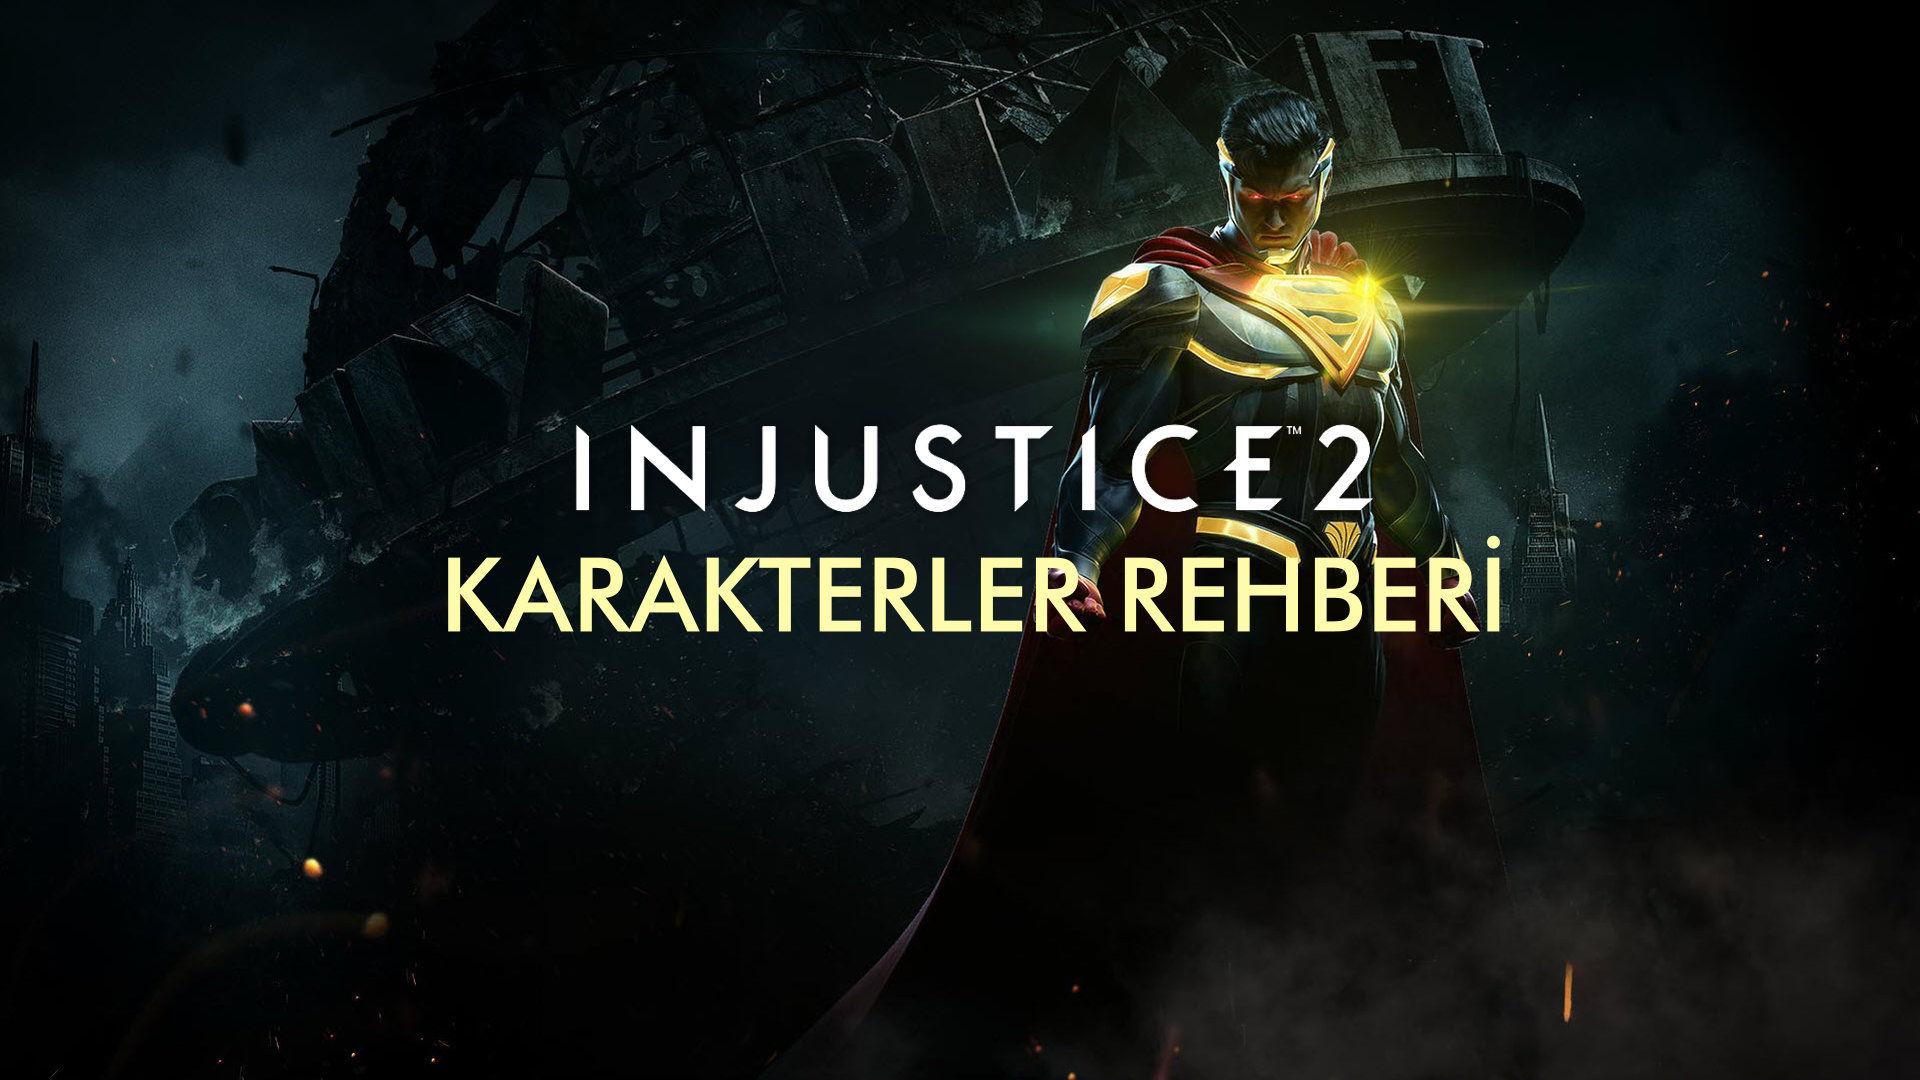 Injustice 2 Karakterler Rehberi